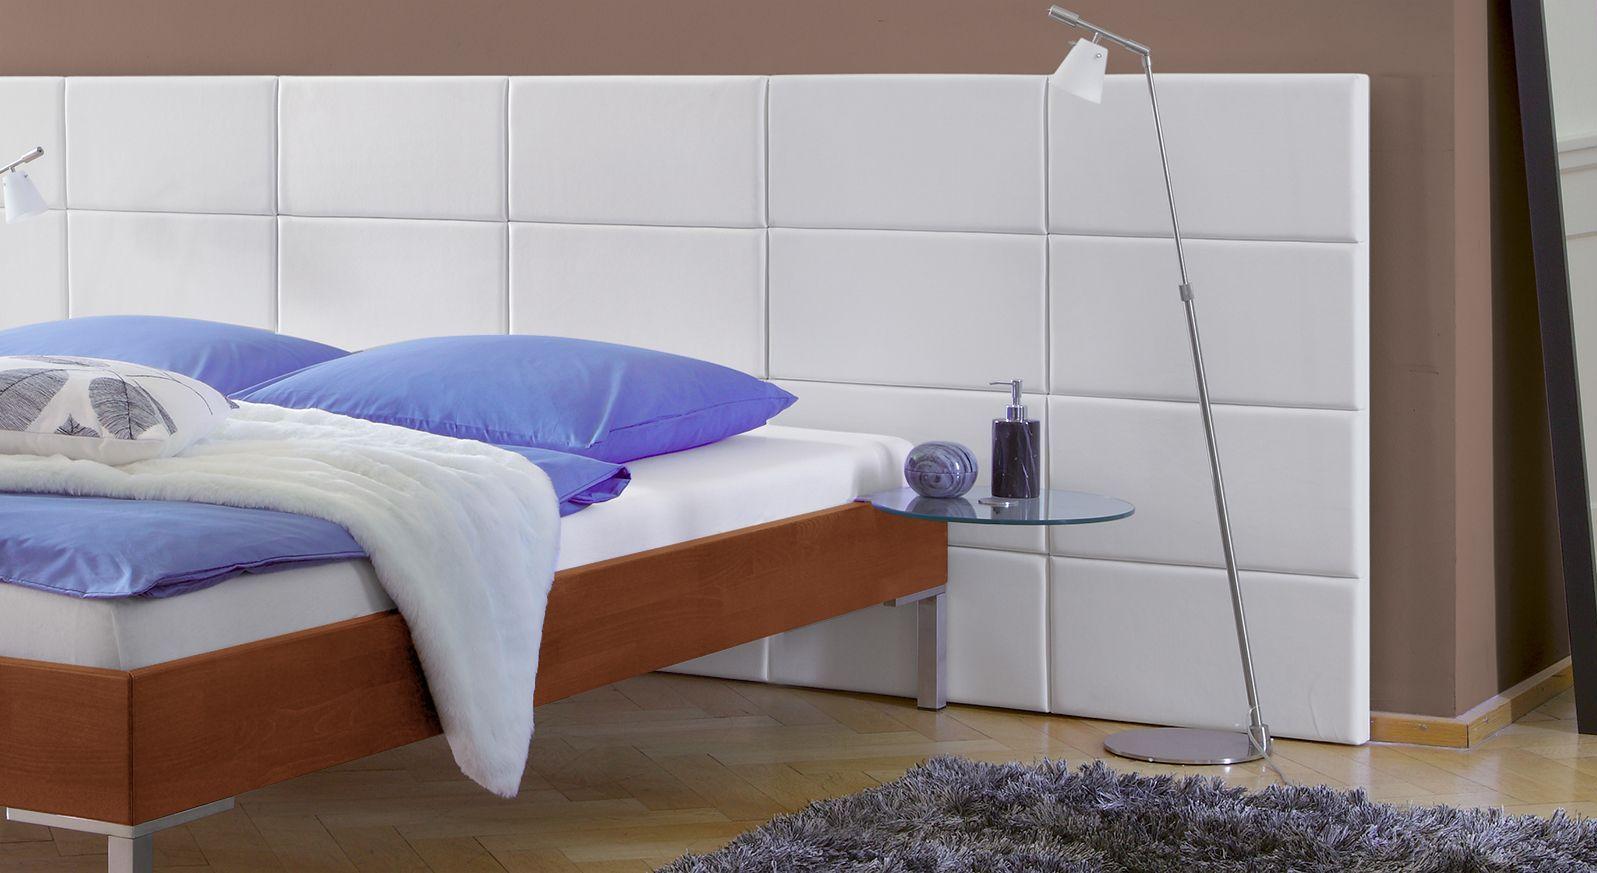 massivholzbett lamesa aus buche in kunstleder mit wandpaneel. Black Bedroom Furniture Sets. Home Design Ideas